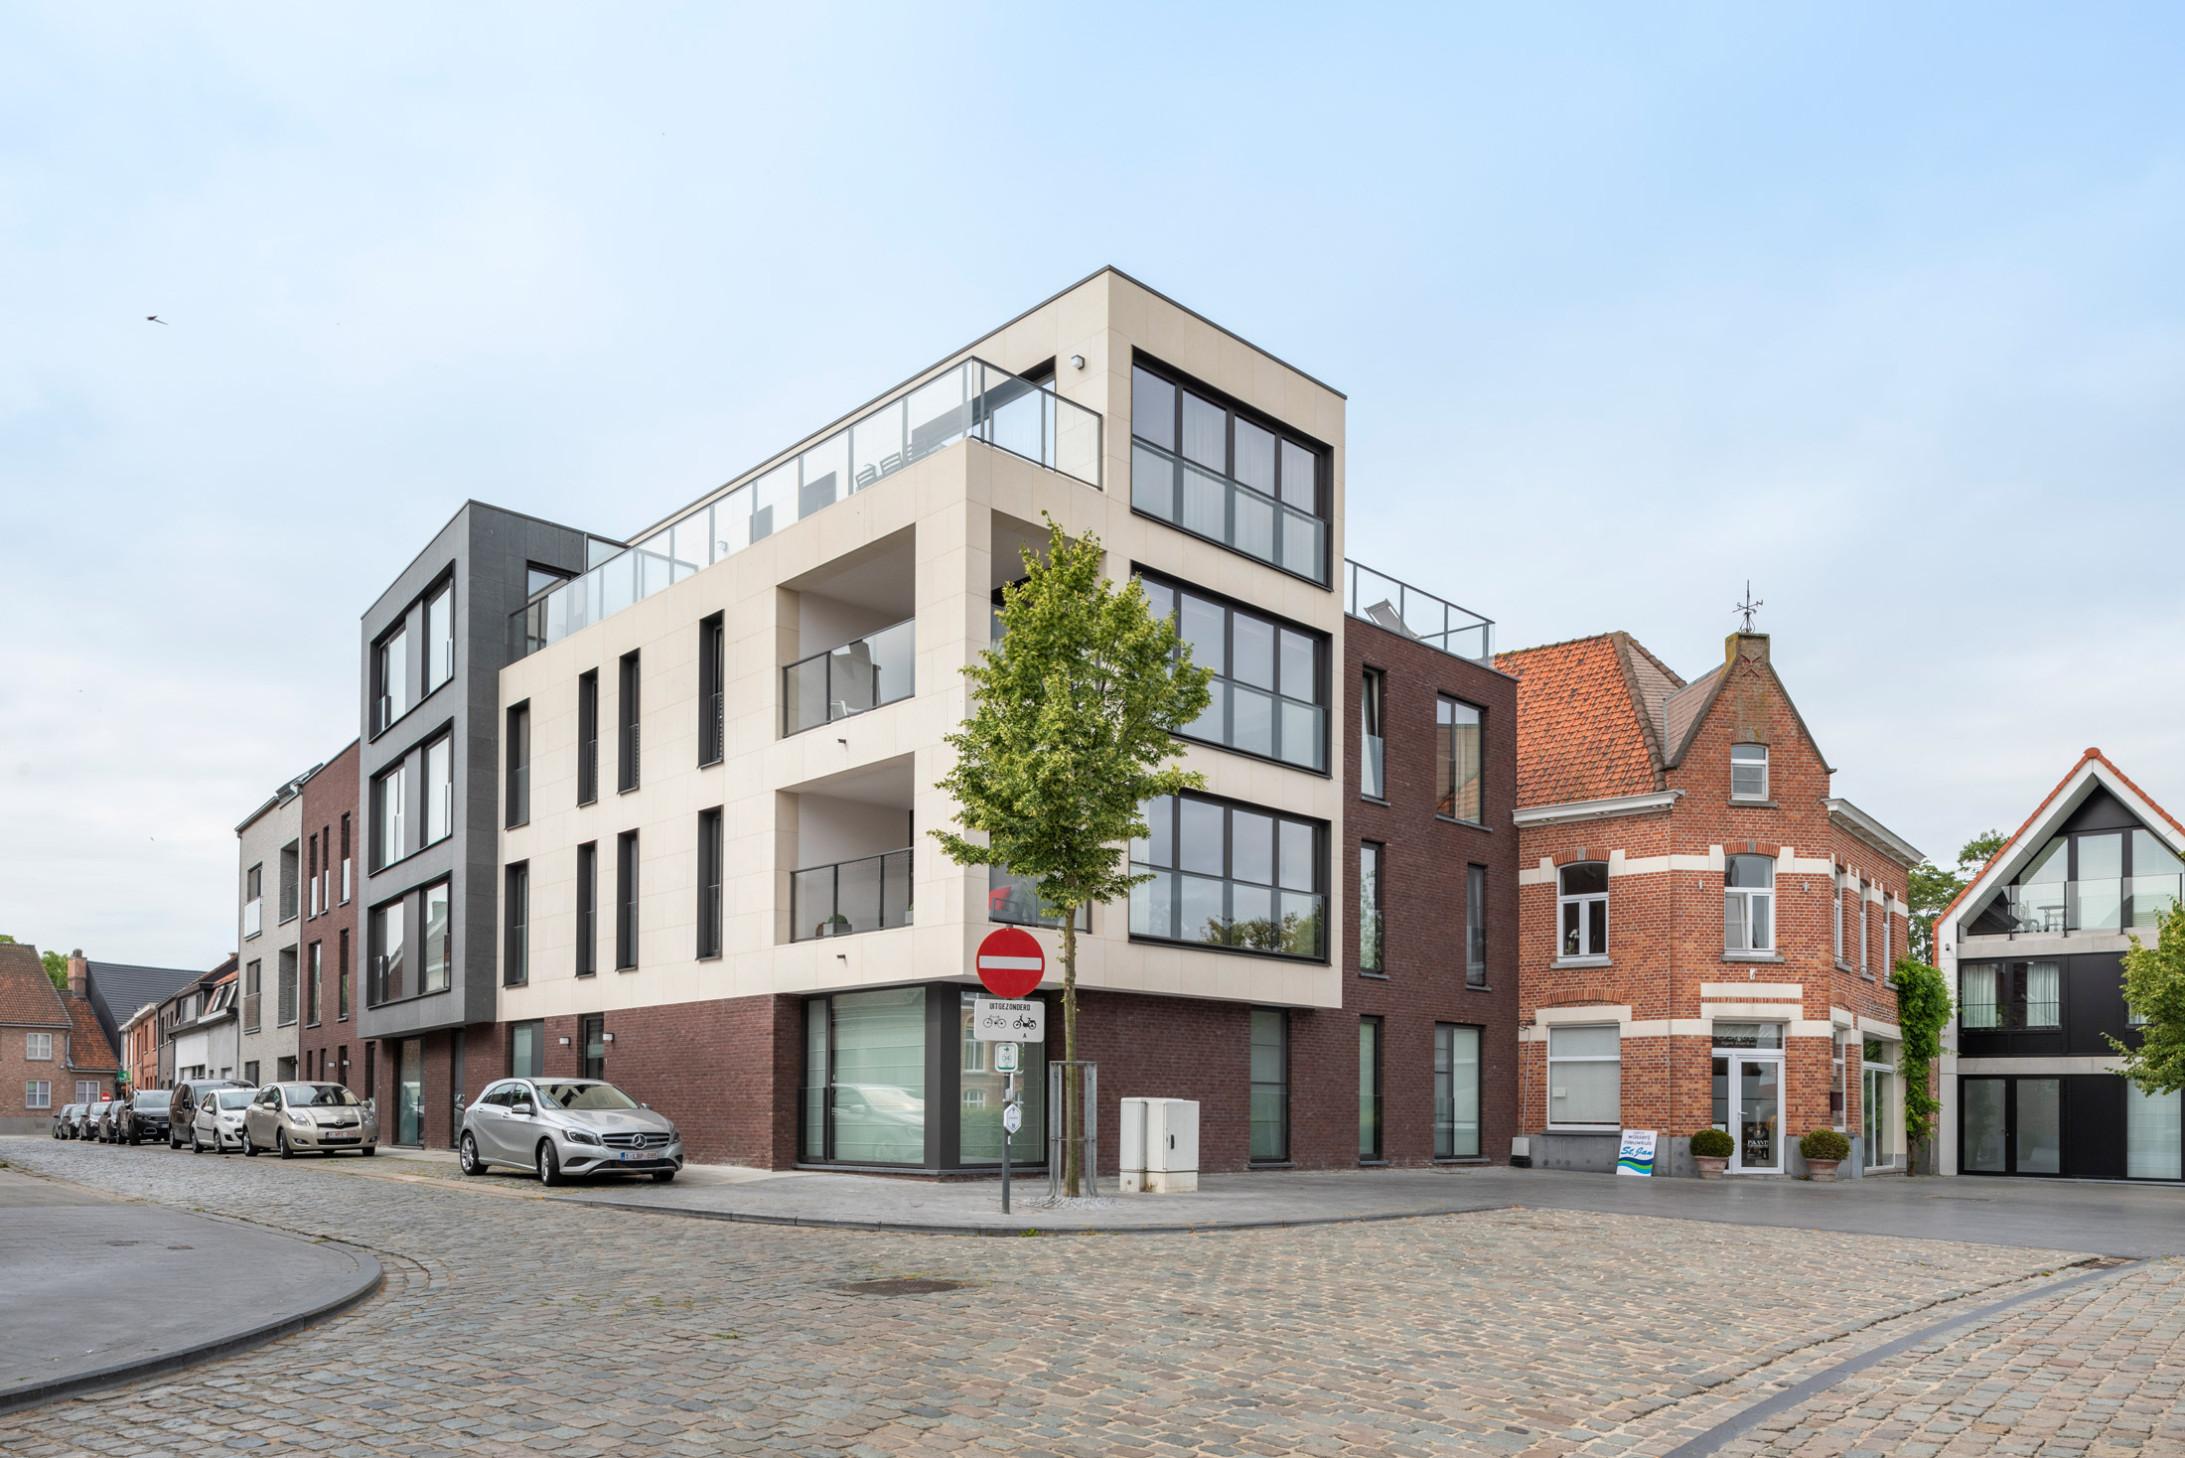 Meergezinswoning3_Oostnieuwkerke_Claeys Architecten.jpg